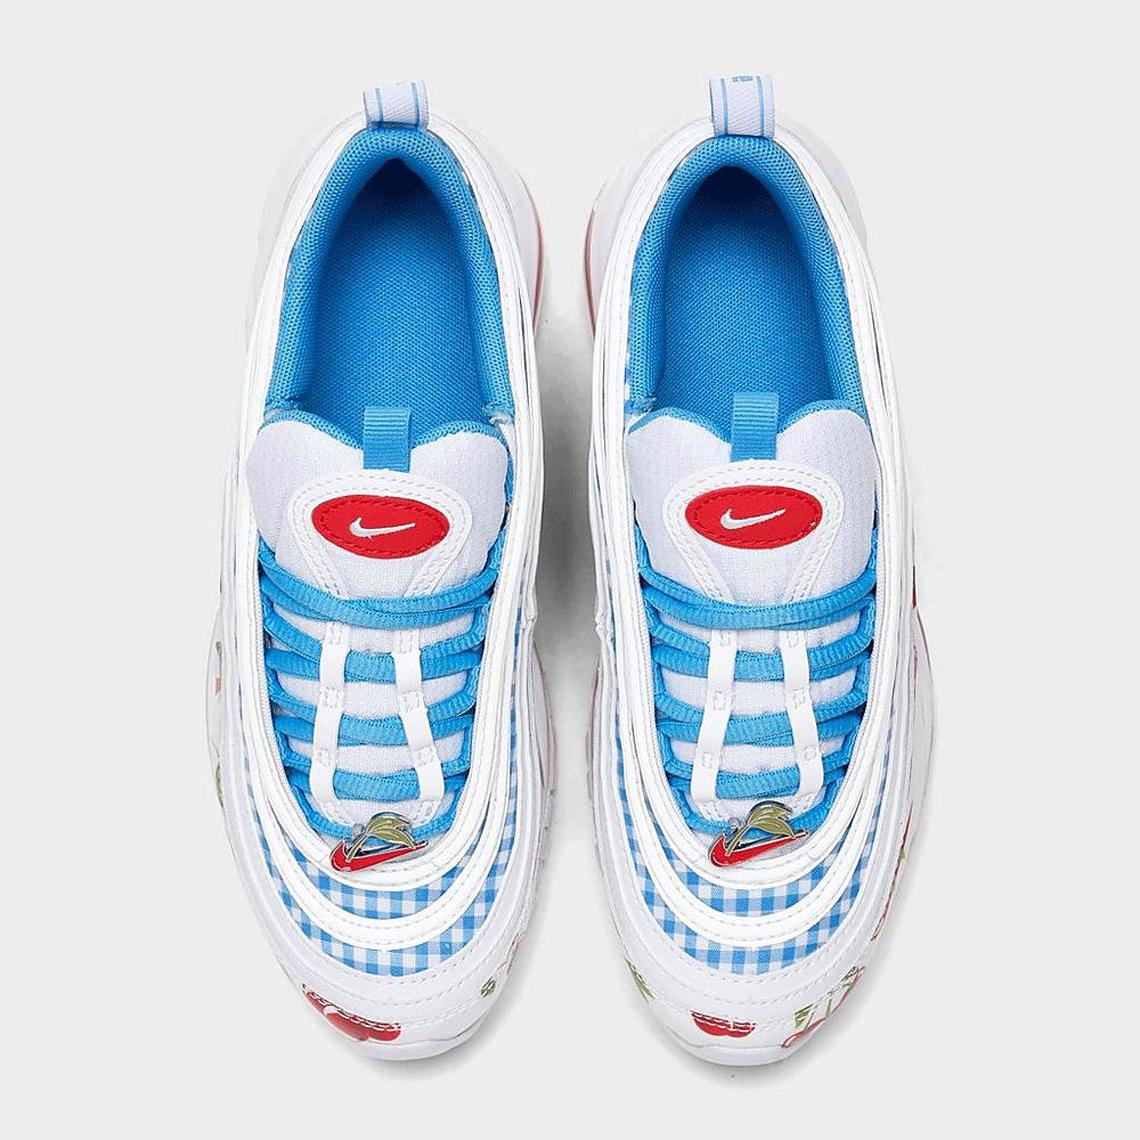 Nike Air Max 97 Cherry Kids CW5806-100